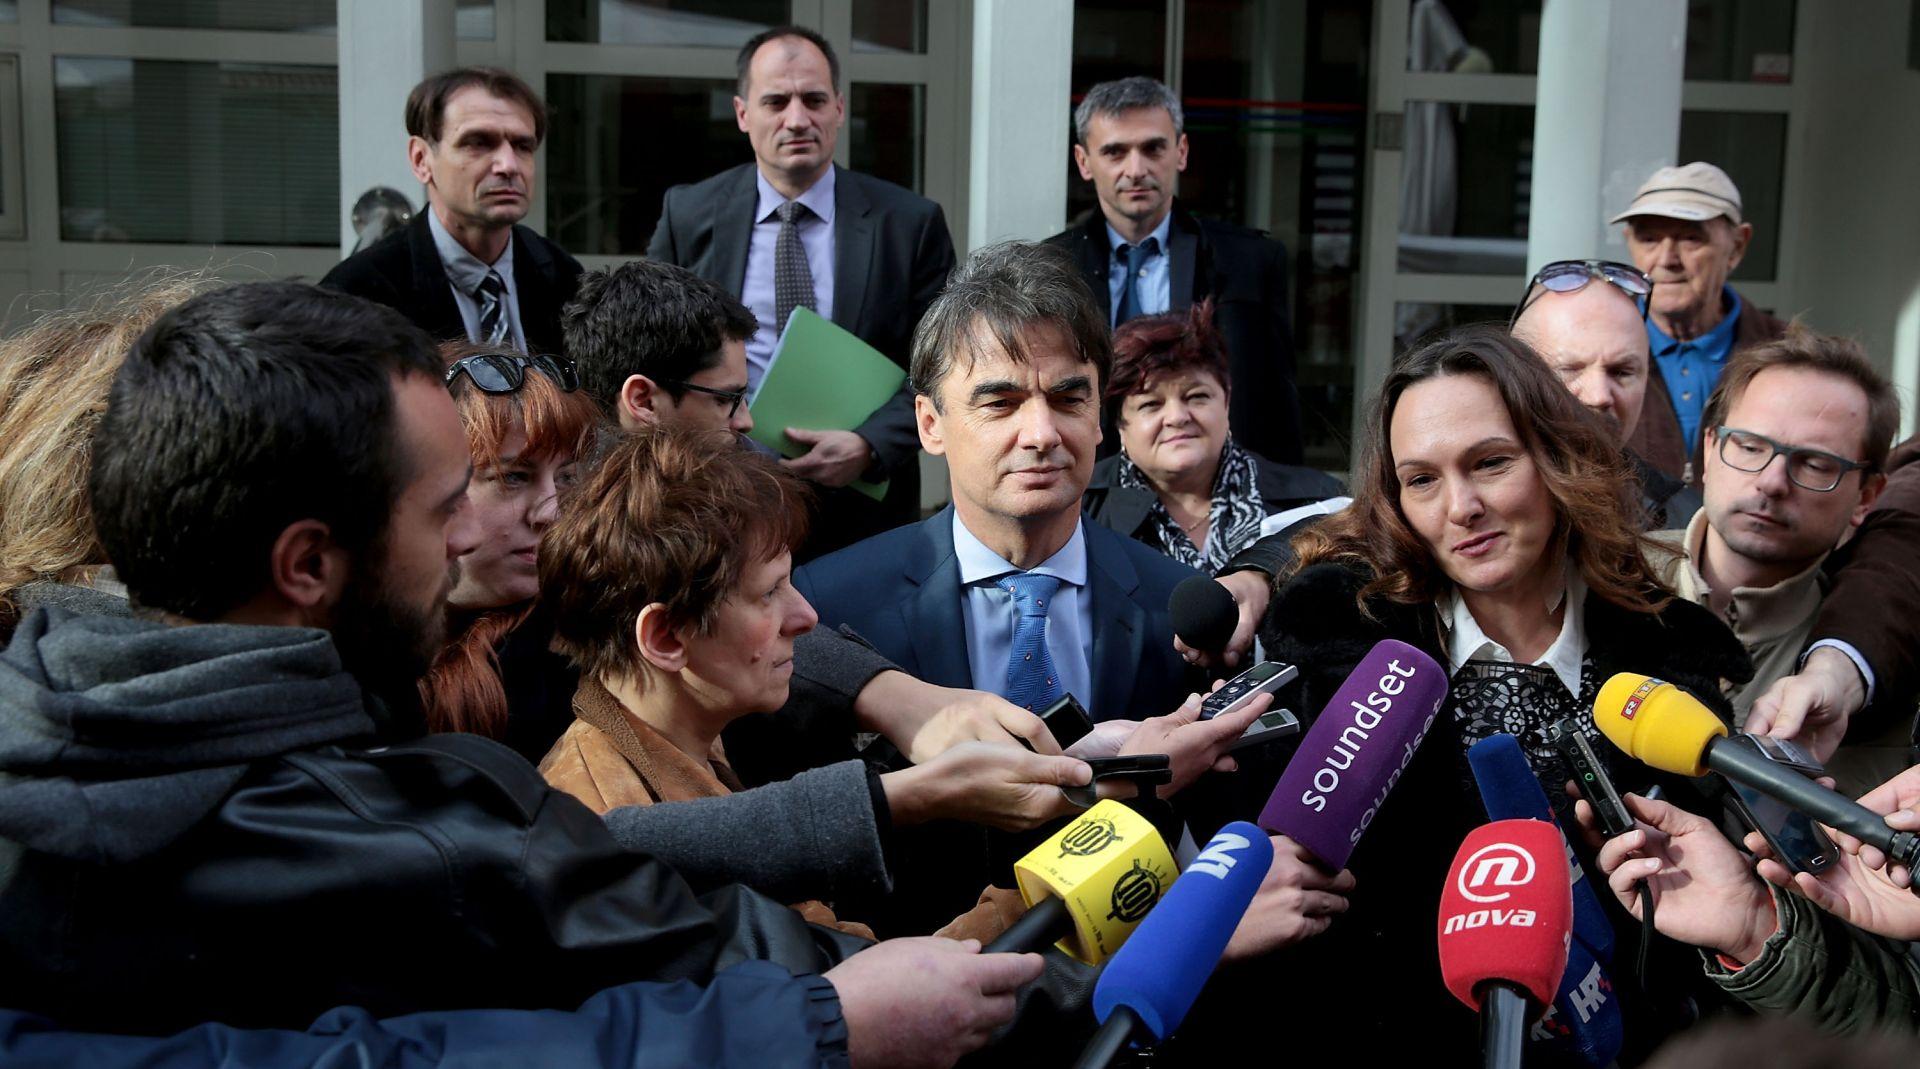 Pregovarači Mosta: Konstruktivan razgovor s SDP-ovom koalicijom o poljoprivredi